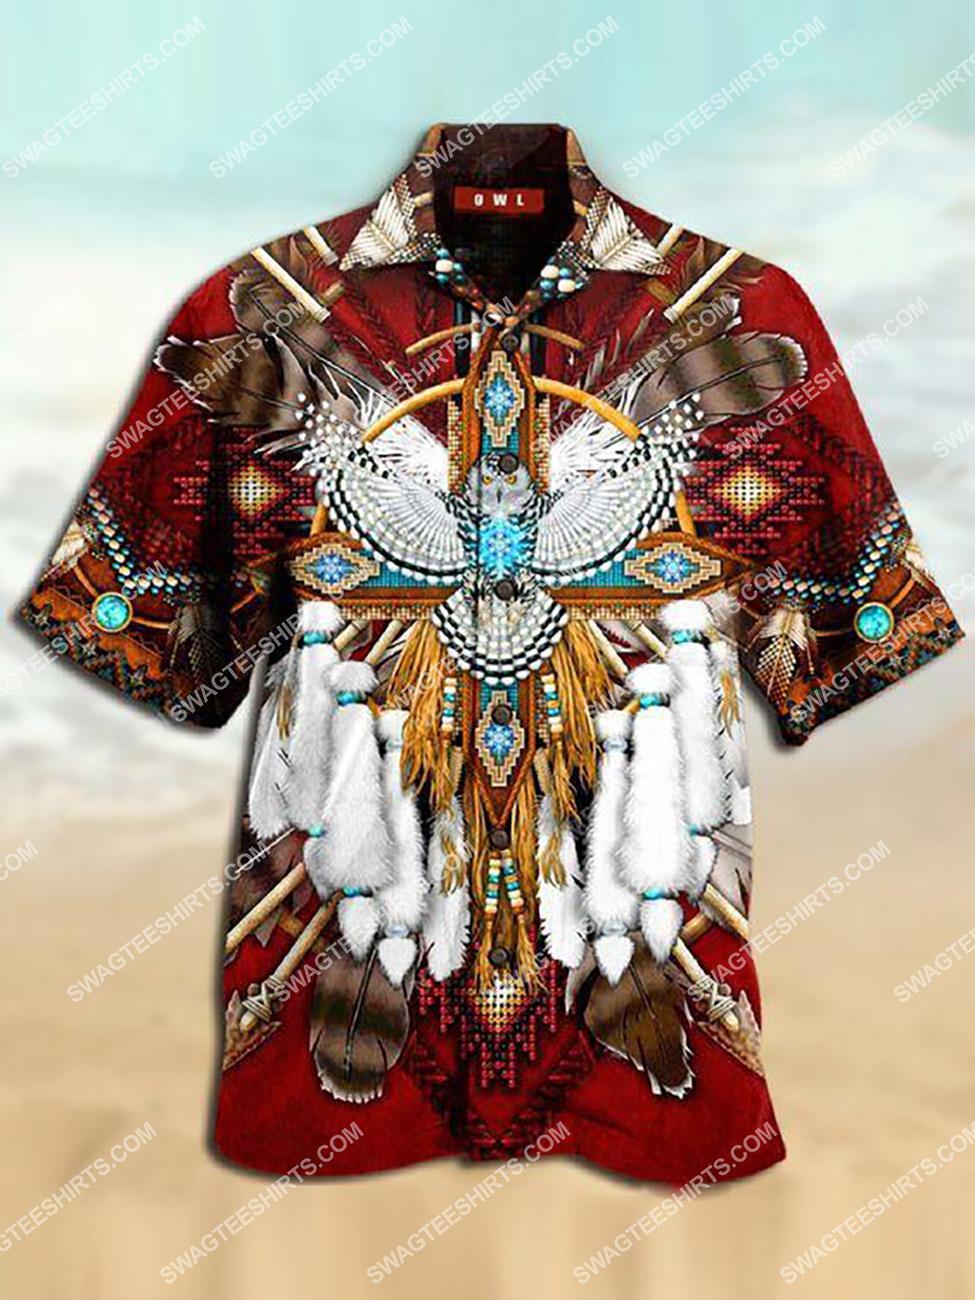 the native american owl all over printed hawaiian shirt 1(1) - Copy